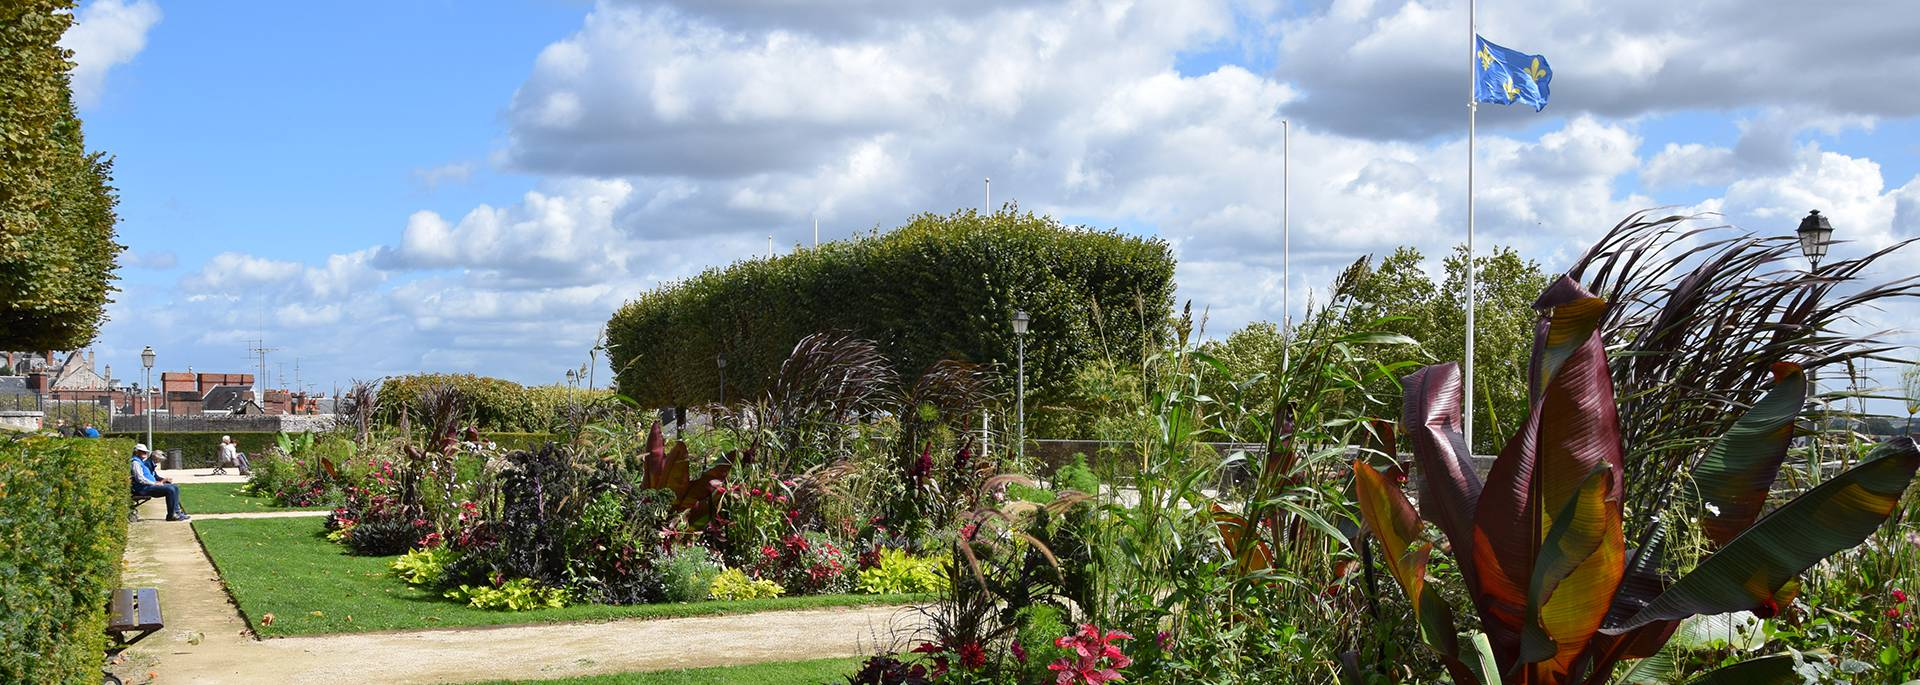 Jardines Saint Sauveur en verano en Blois